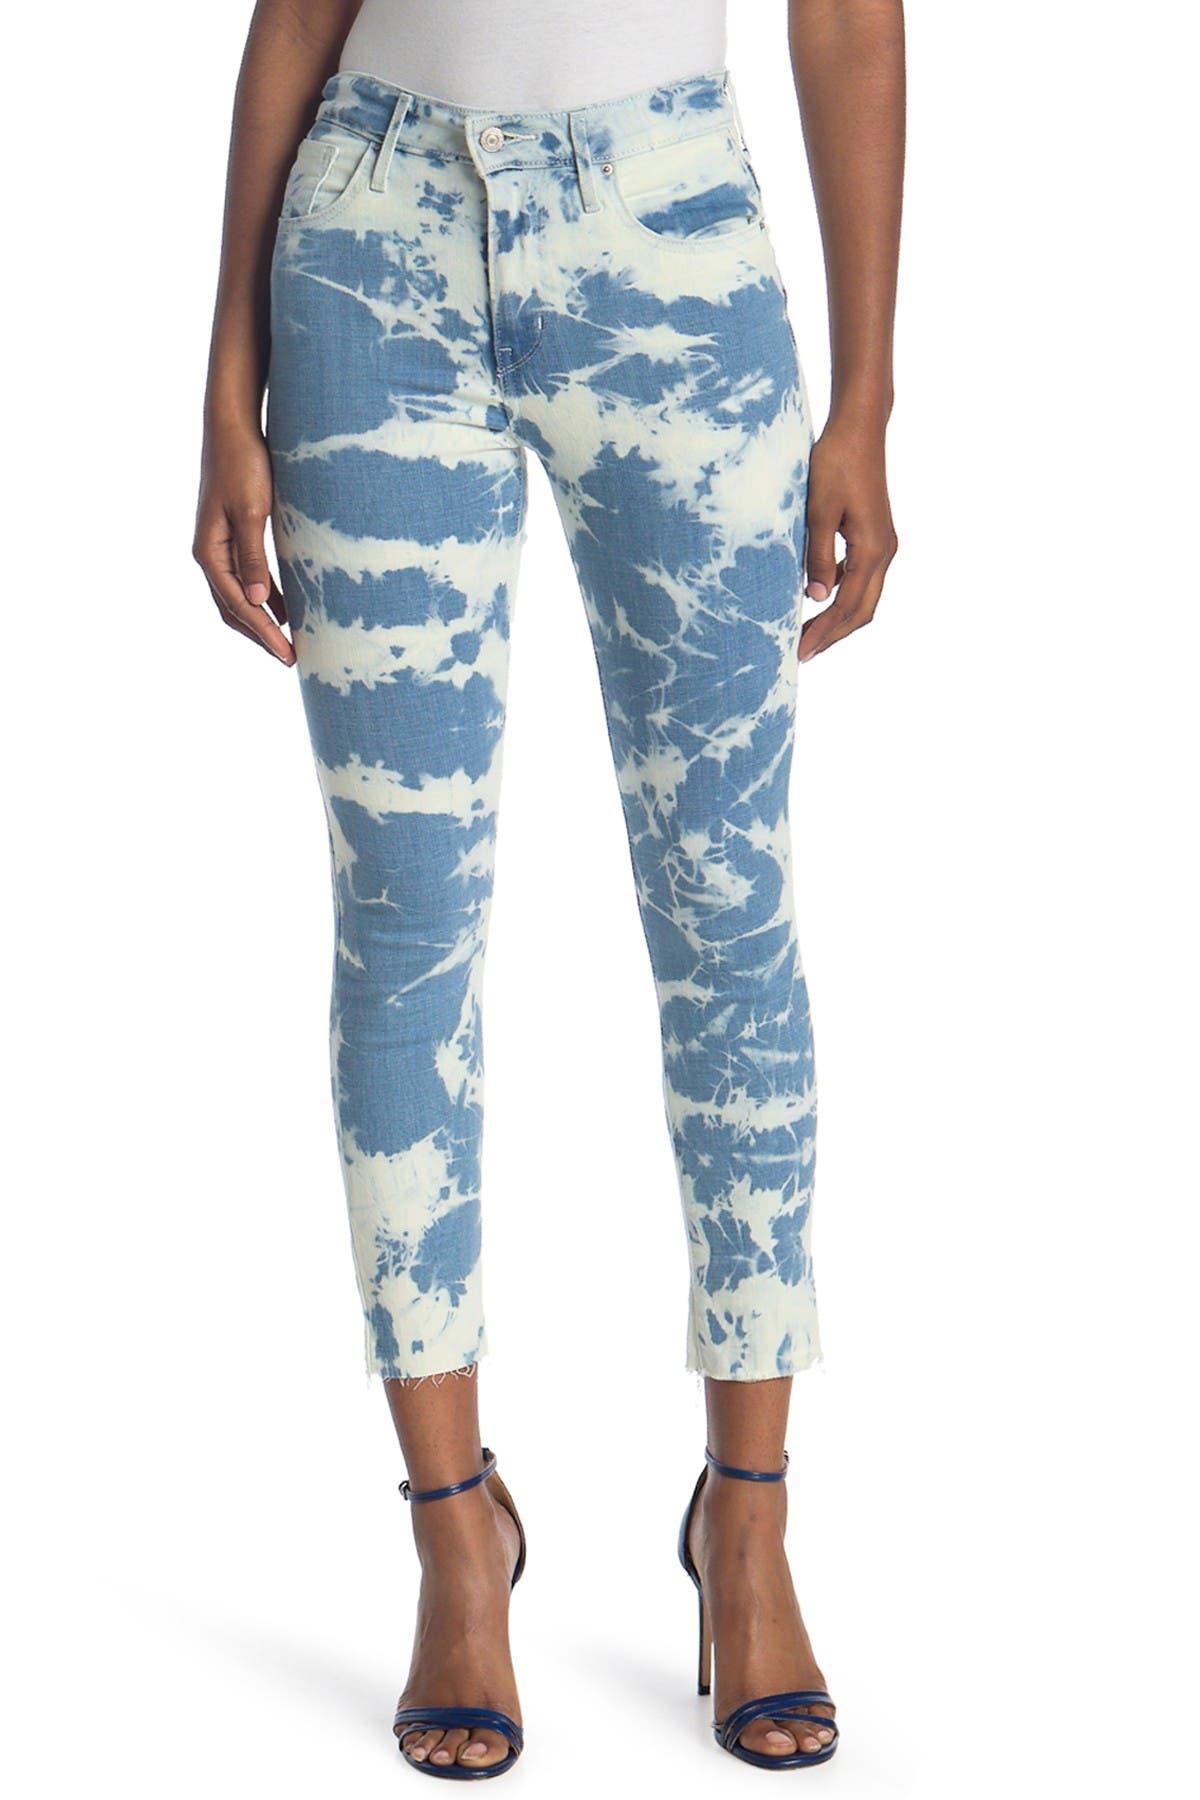 Image of Levi's 721 Acid Wash High Waisted Skinny Jeans